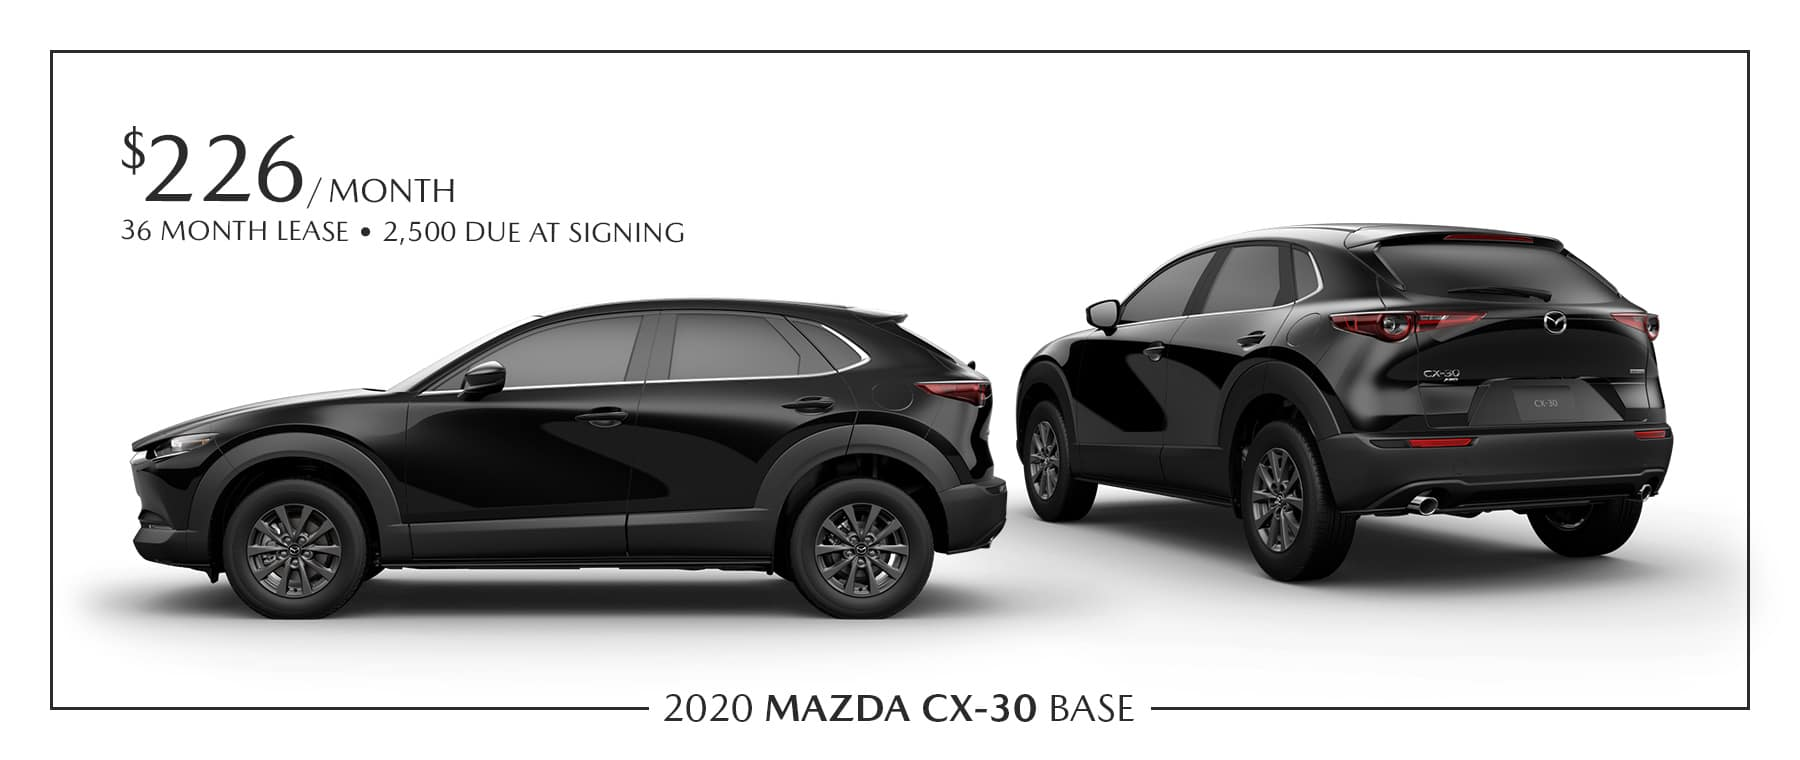 MAZDA_CX30_226MO_1800x760